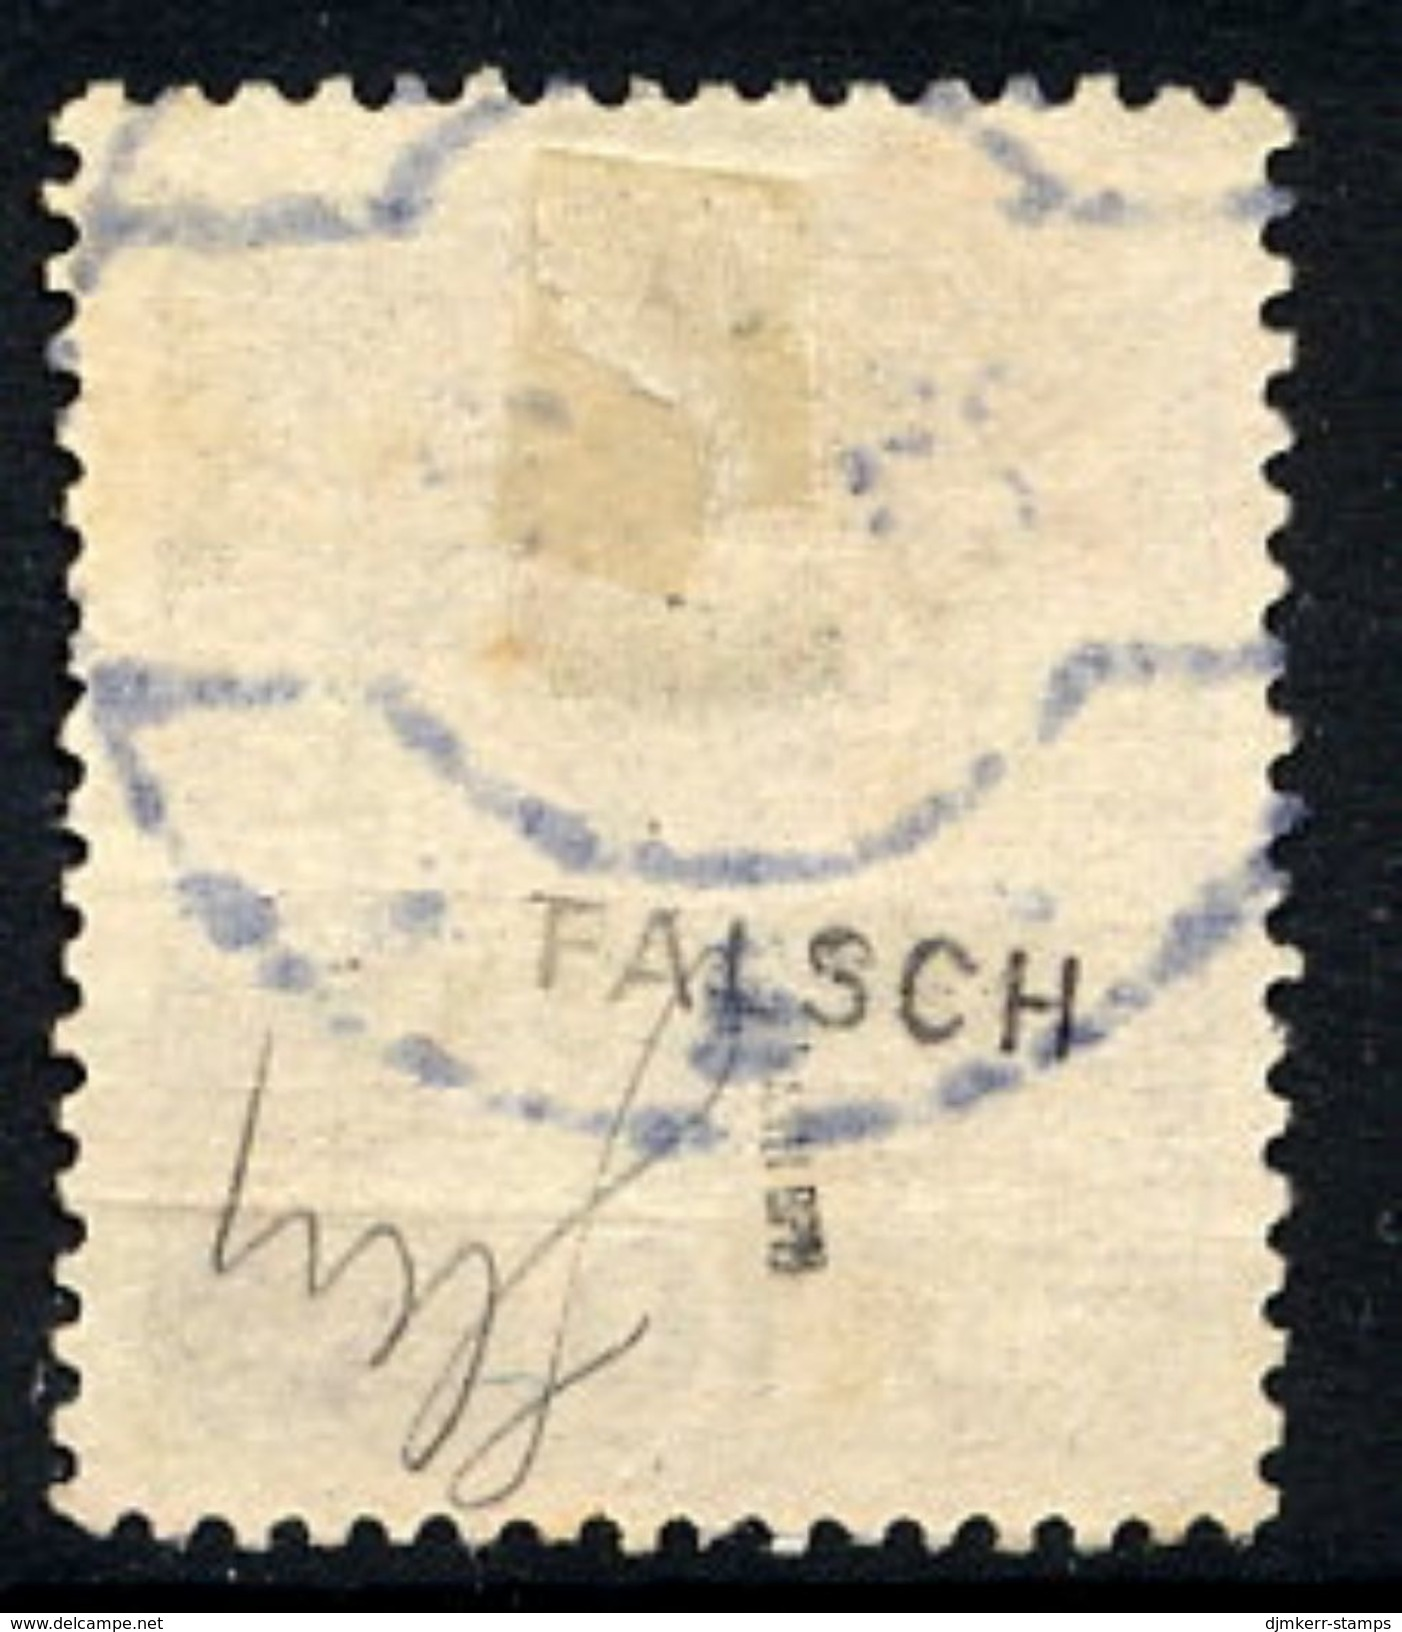 POLAND 1919 Krakow Poczta Polska Forged.overprint On 10 H. Arms Used.  Michel  32 - 1919-1939 Republic